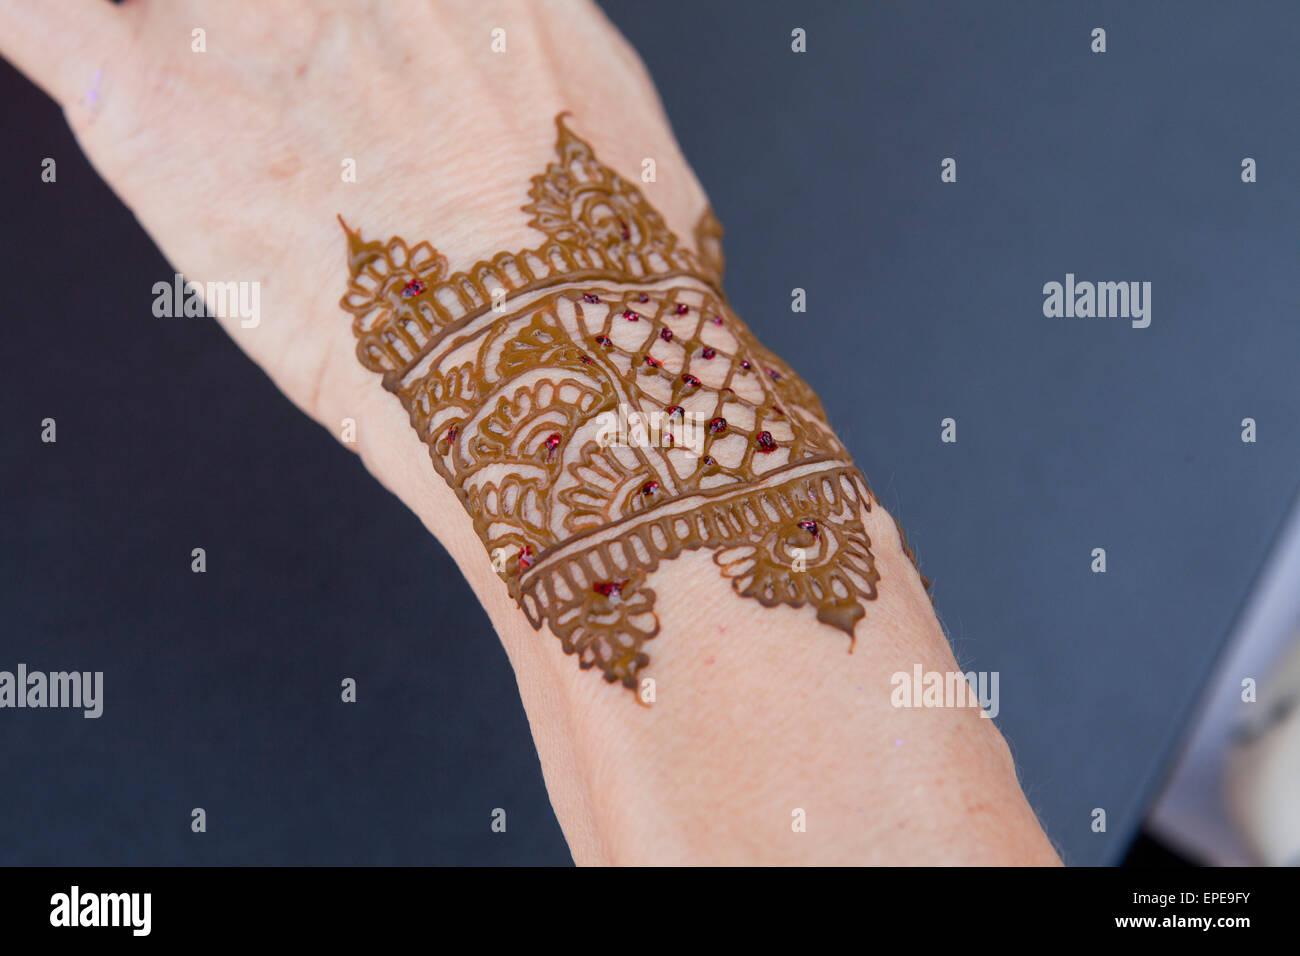 Mehndi - Indian skin decoration with henna on hand - Stock Image